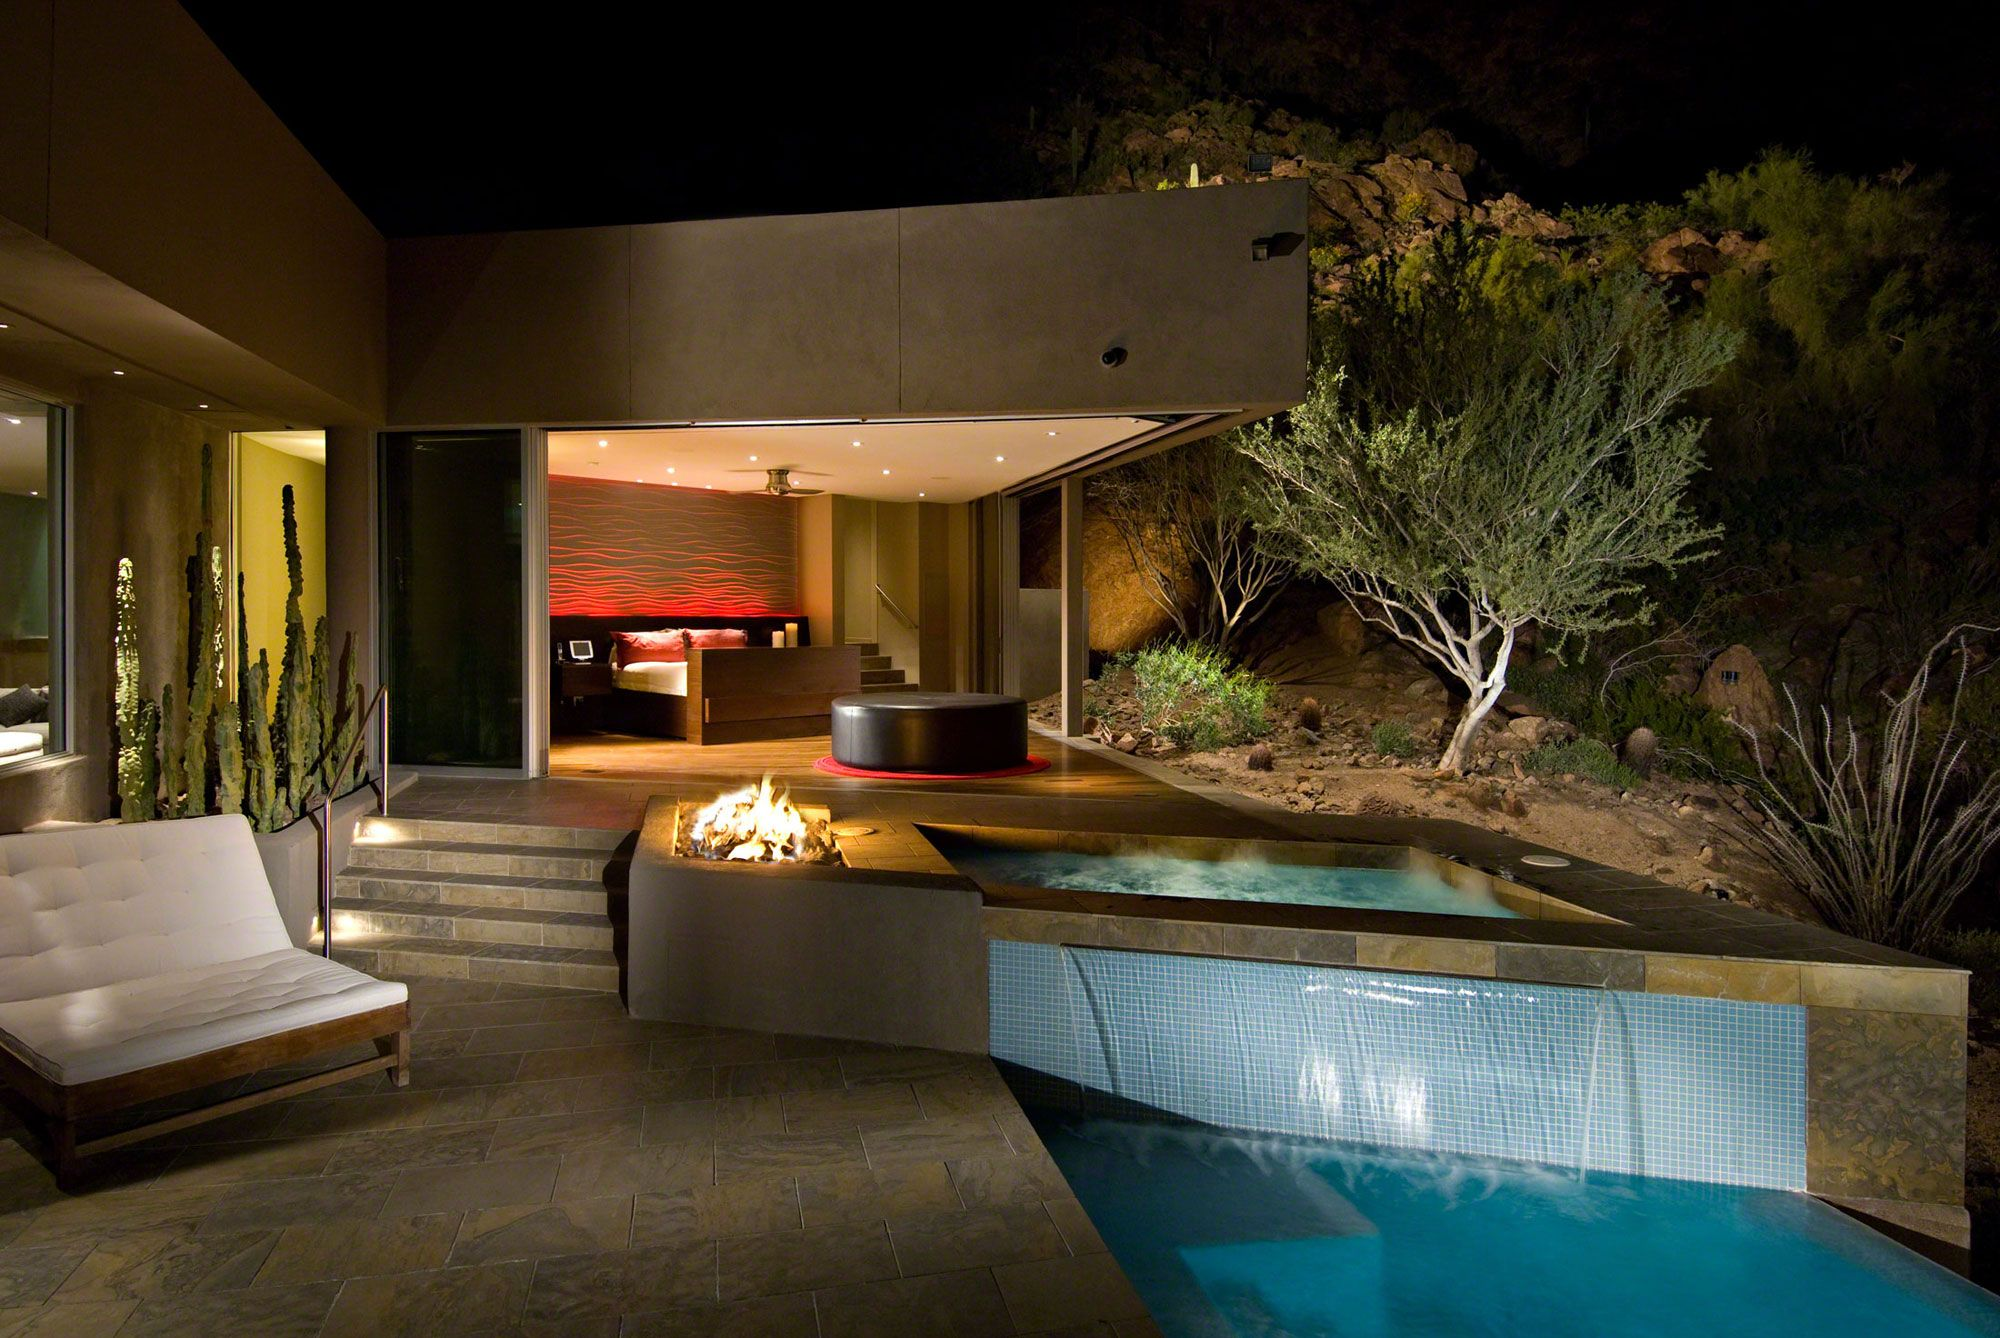 creative designs in lighting. Nightime Illumination Creative Designs In Lighting I